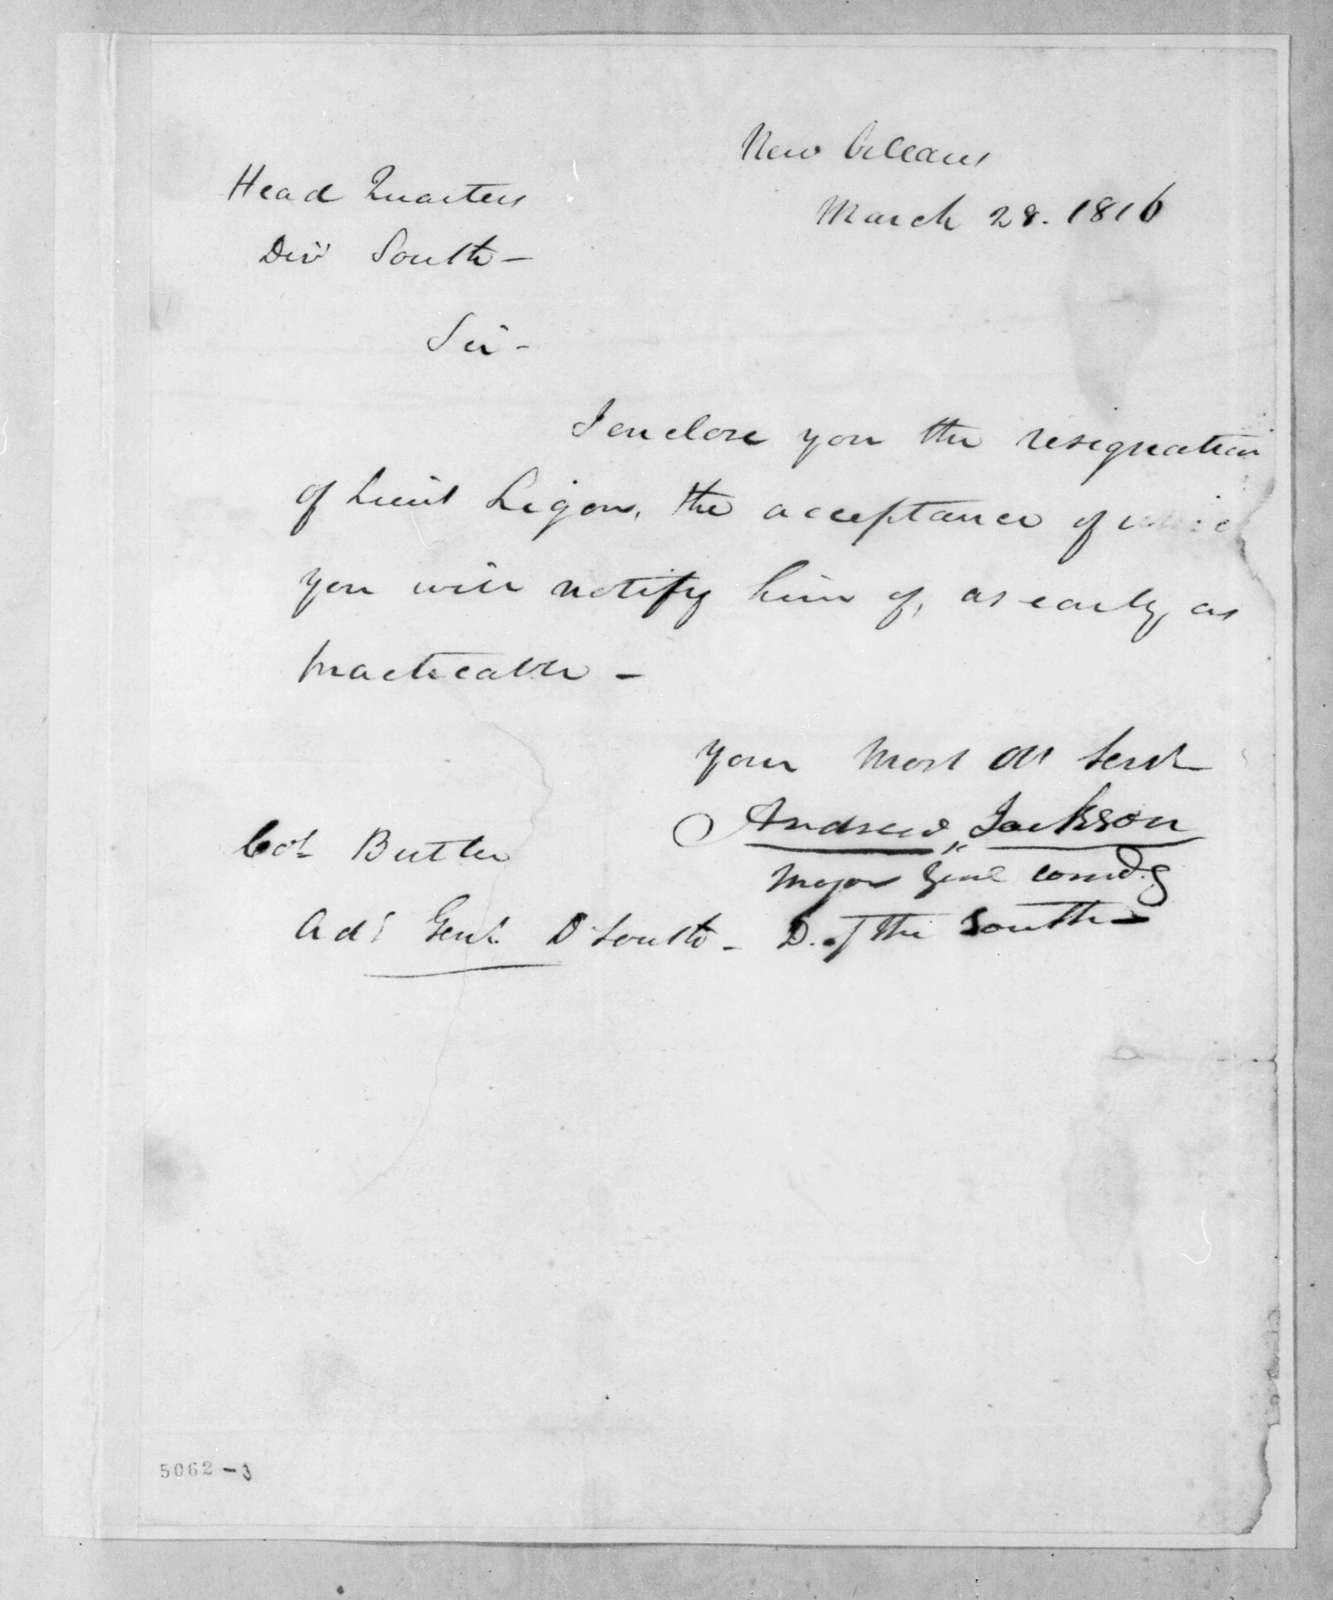 Andrew Jackson to Robert Butler, March 28, 1816